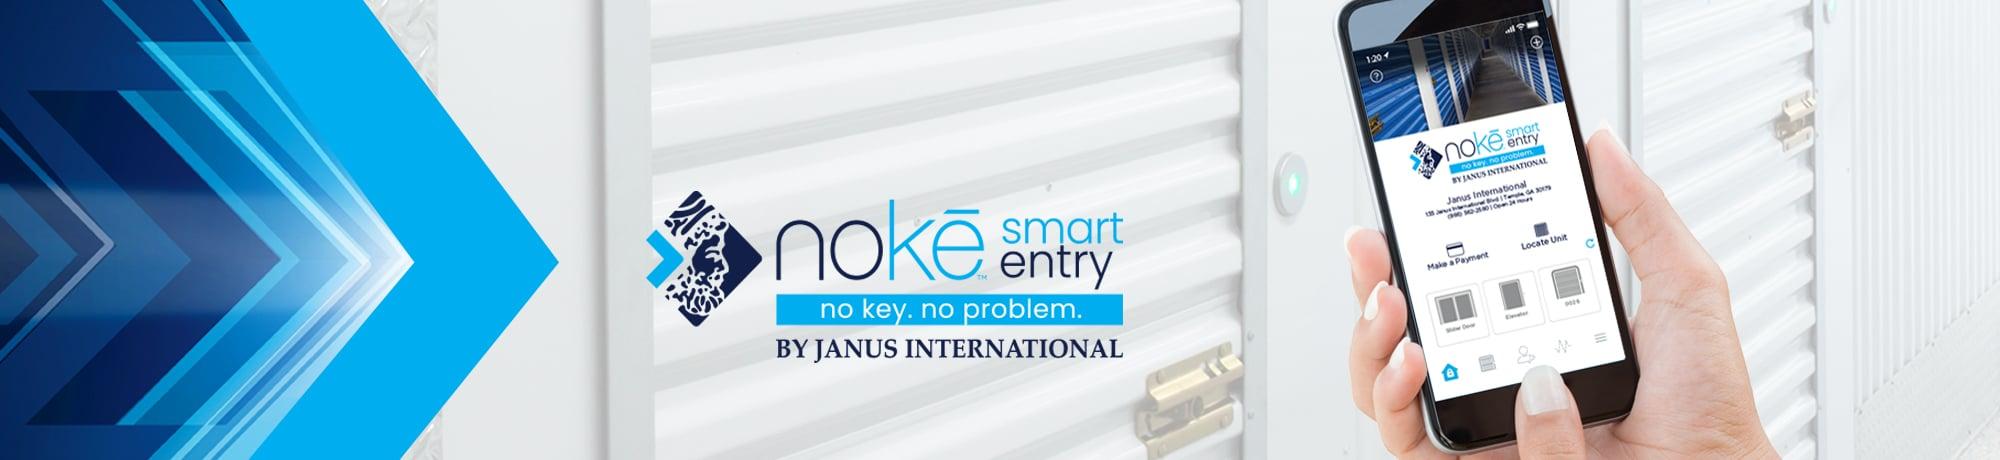 Noke Smart_Entry_banner_2021